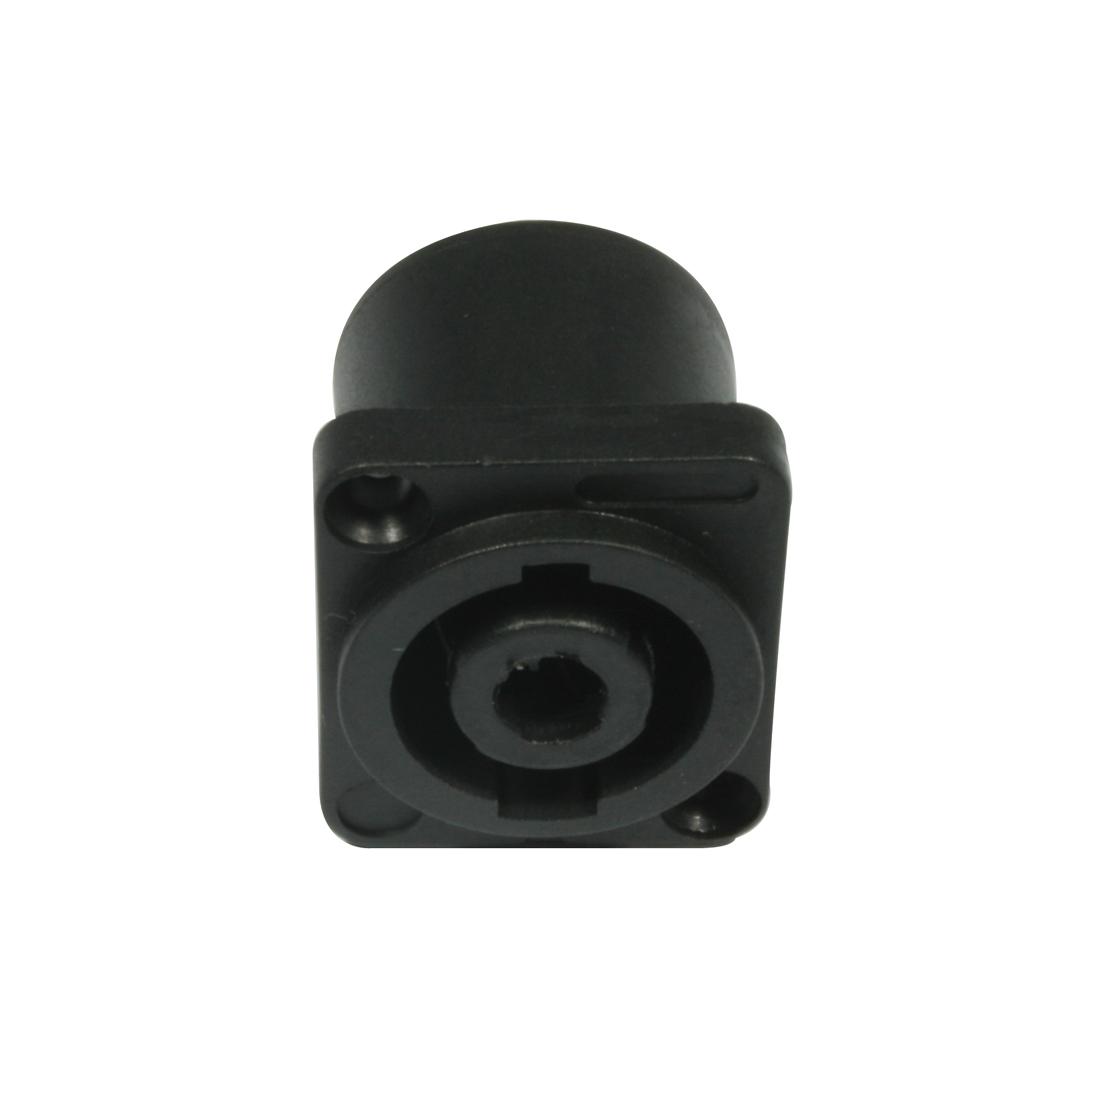 Accu Cable AC-C-PS4M Speaker 4pin male